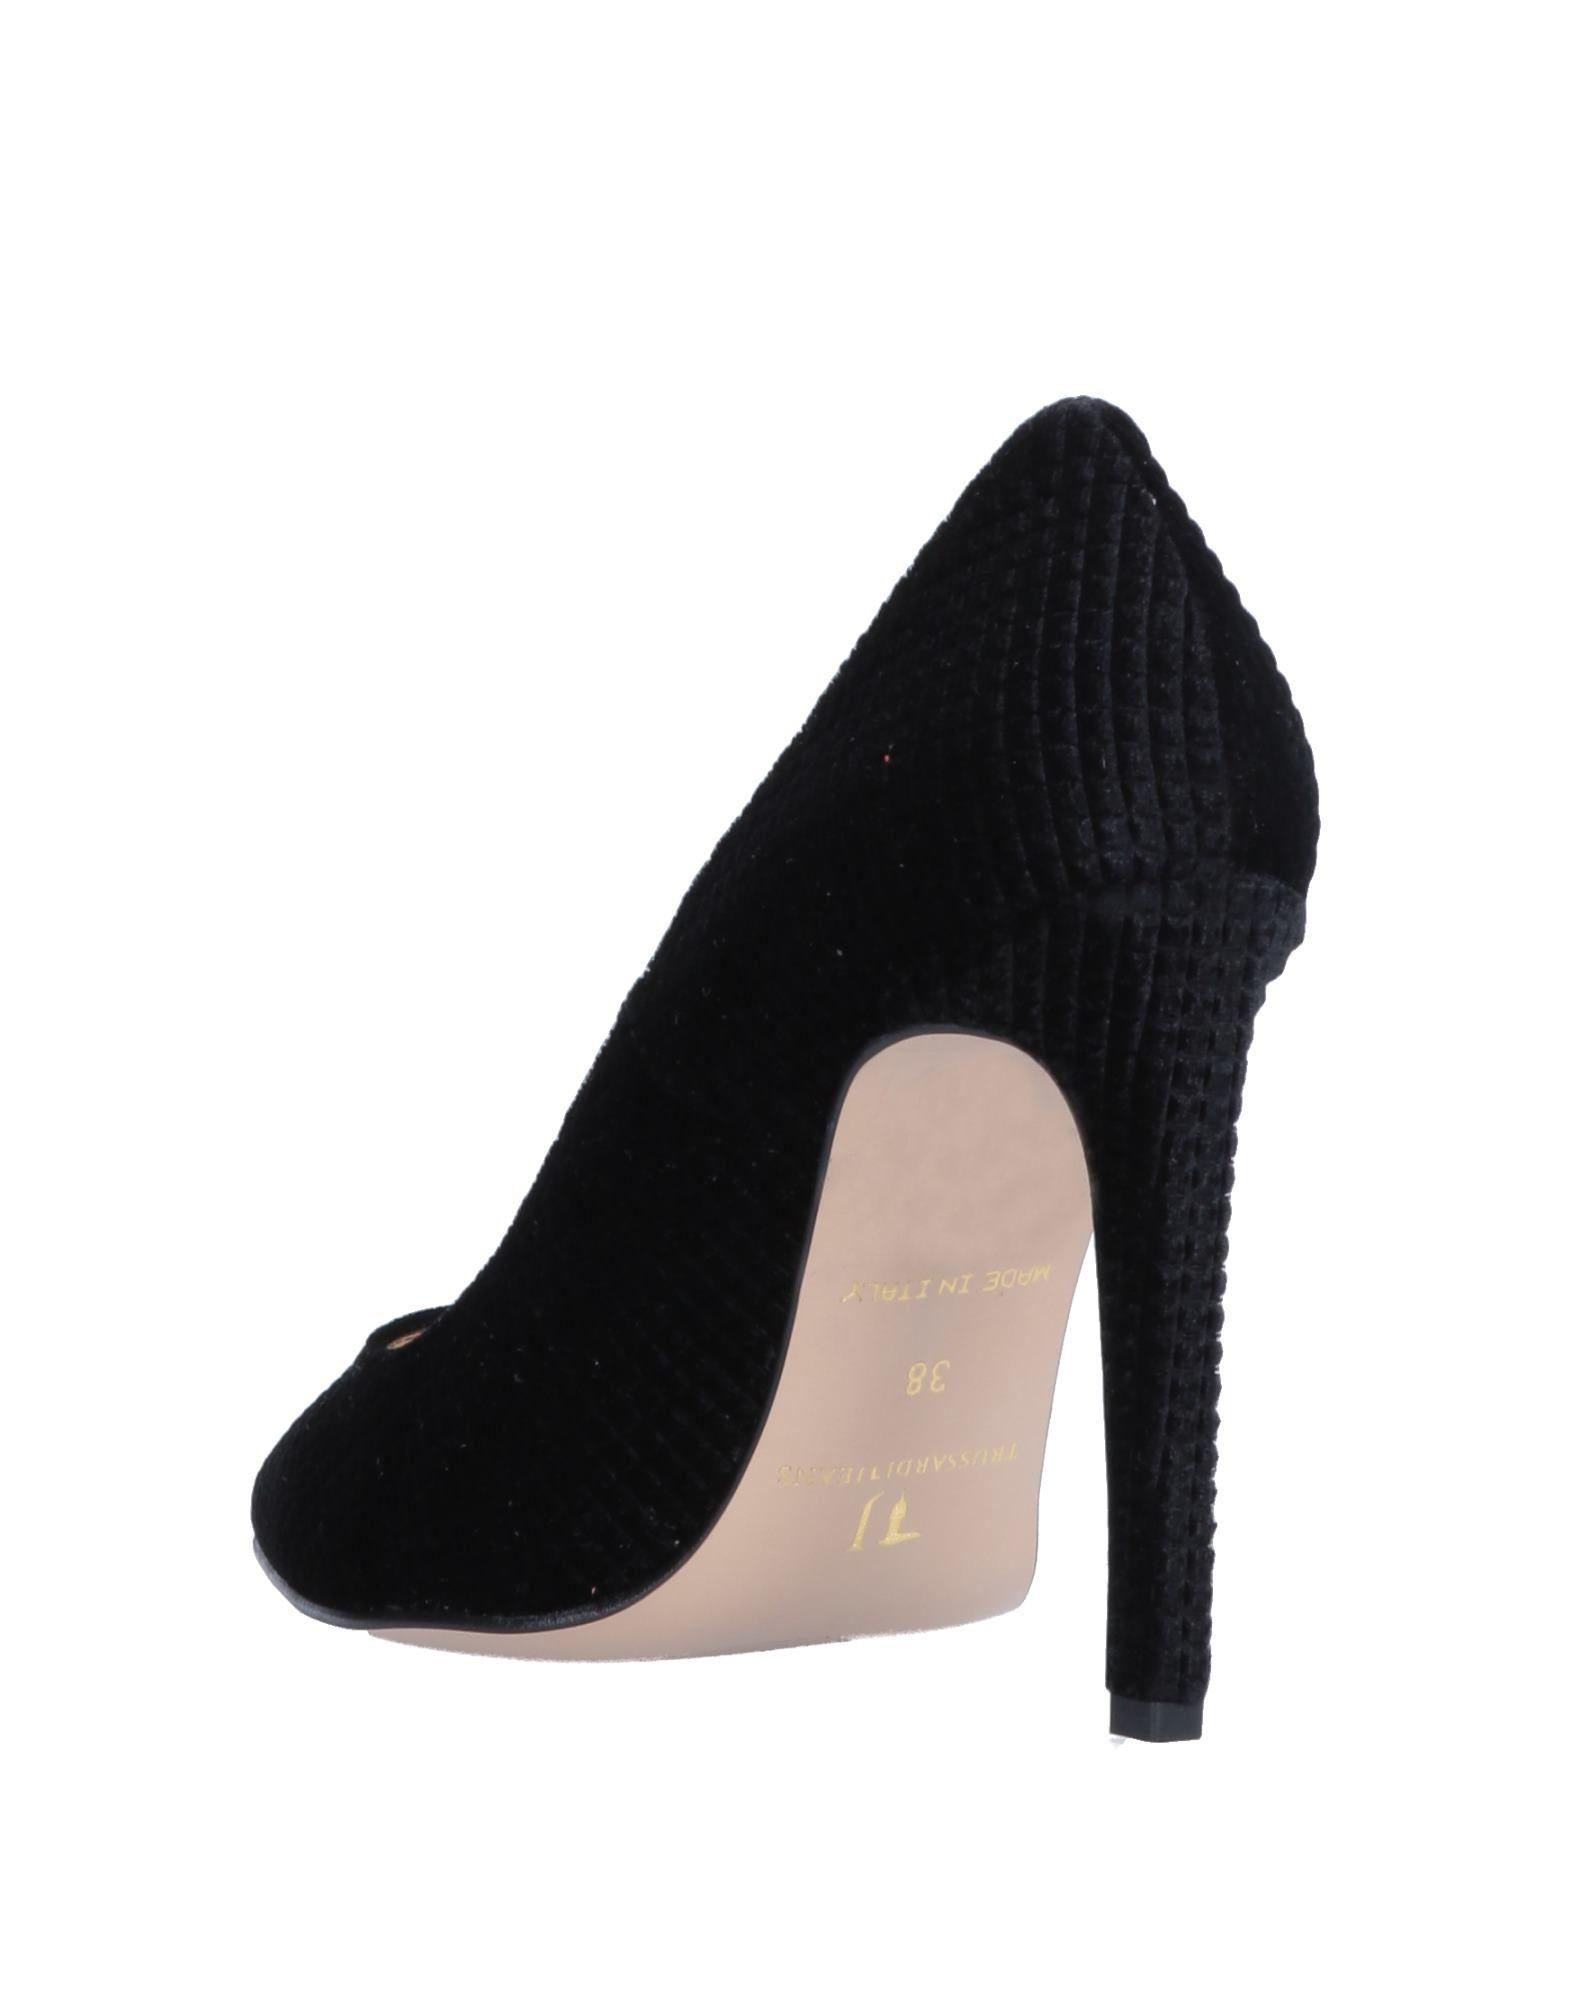 Trussardi Trussardi Trussardi Jeans Pumps Damen  11545917XT Gute Qualität beliebte Schuhe e46098